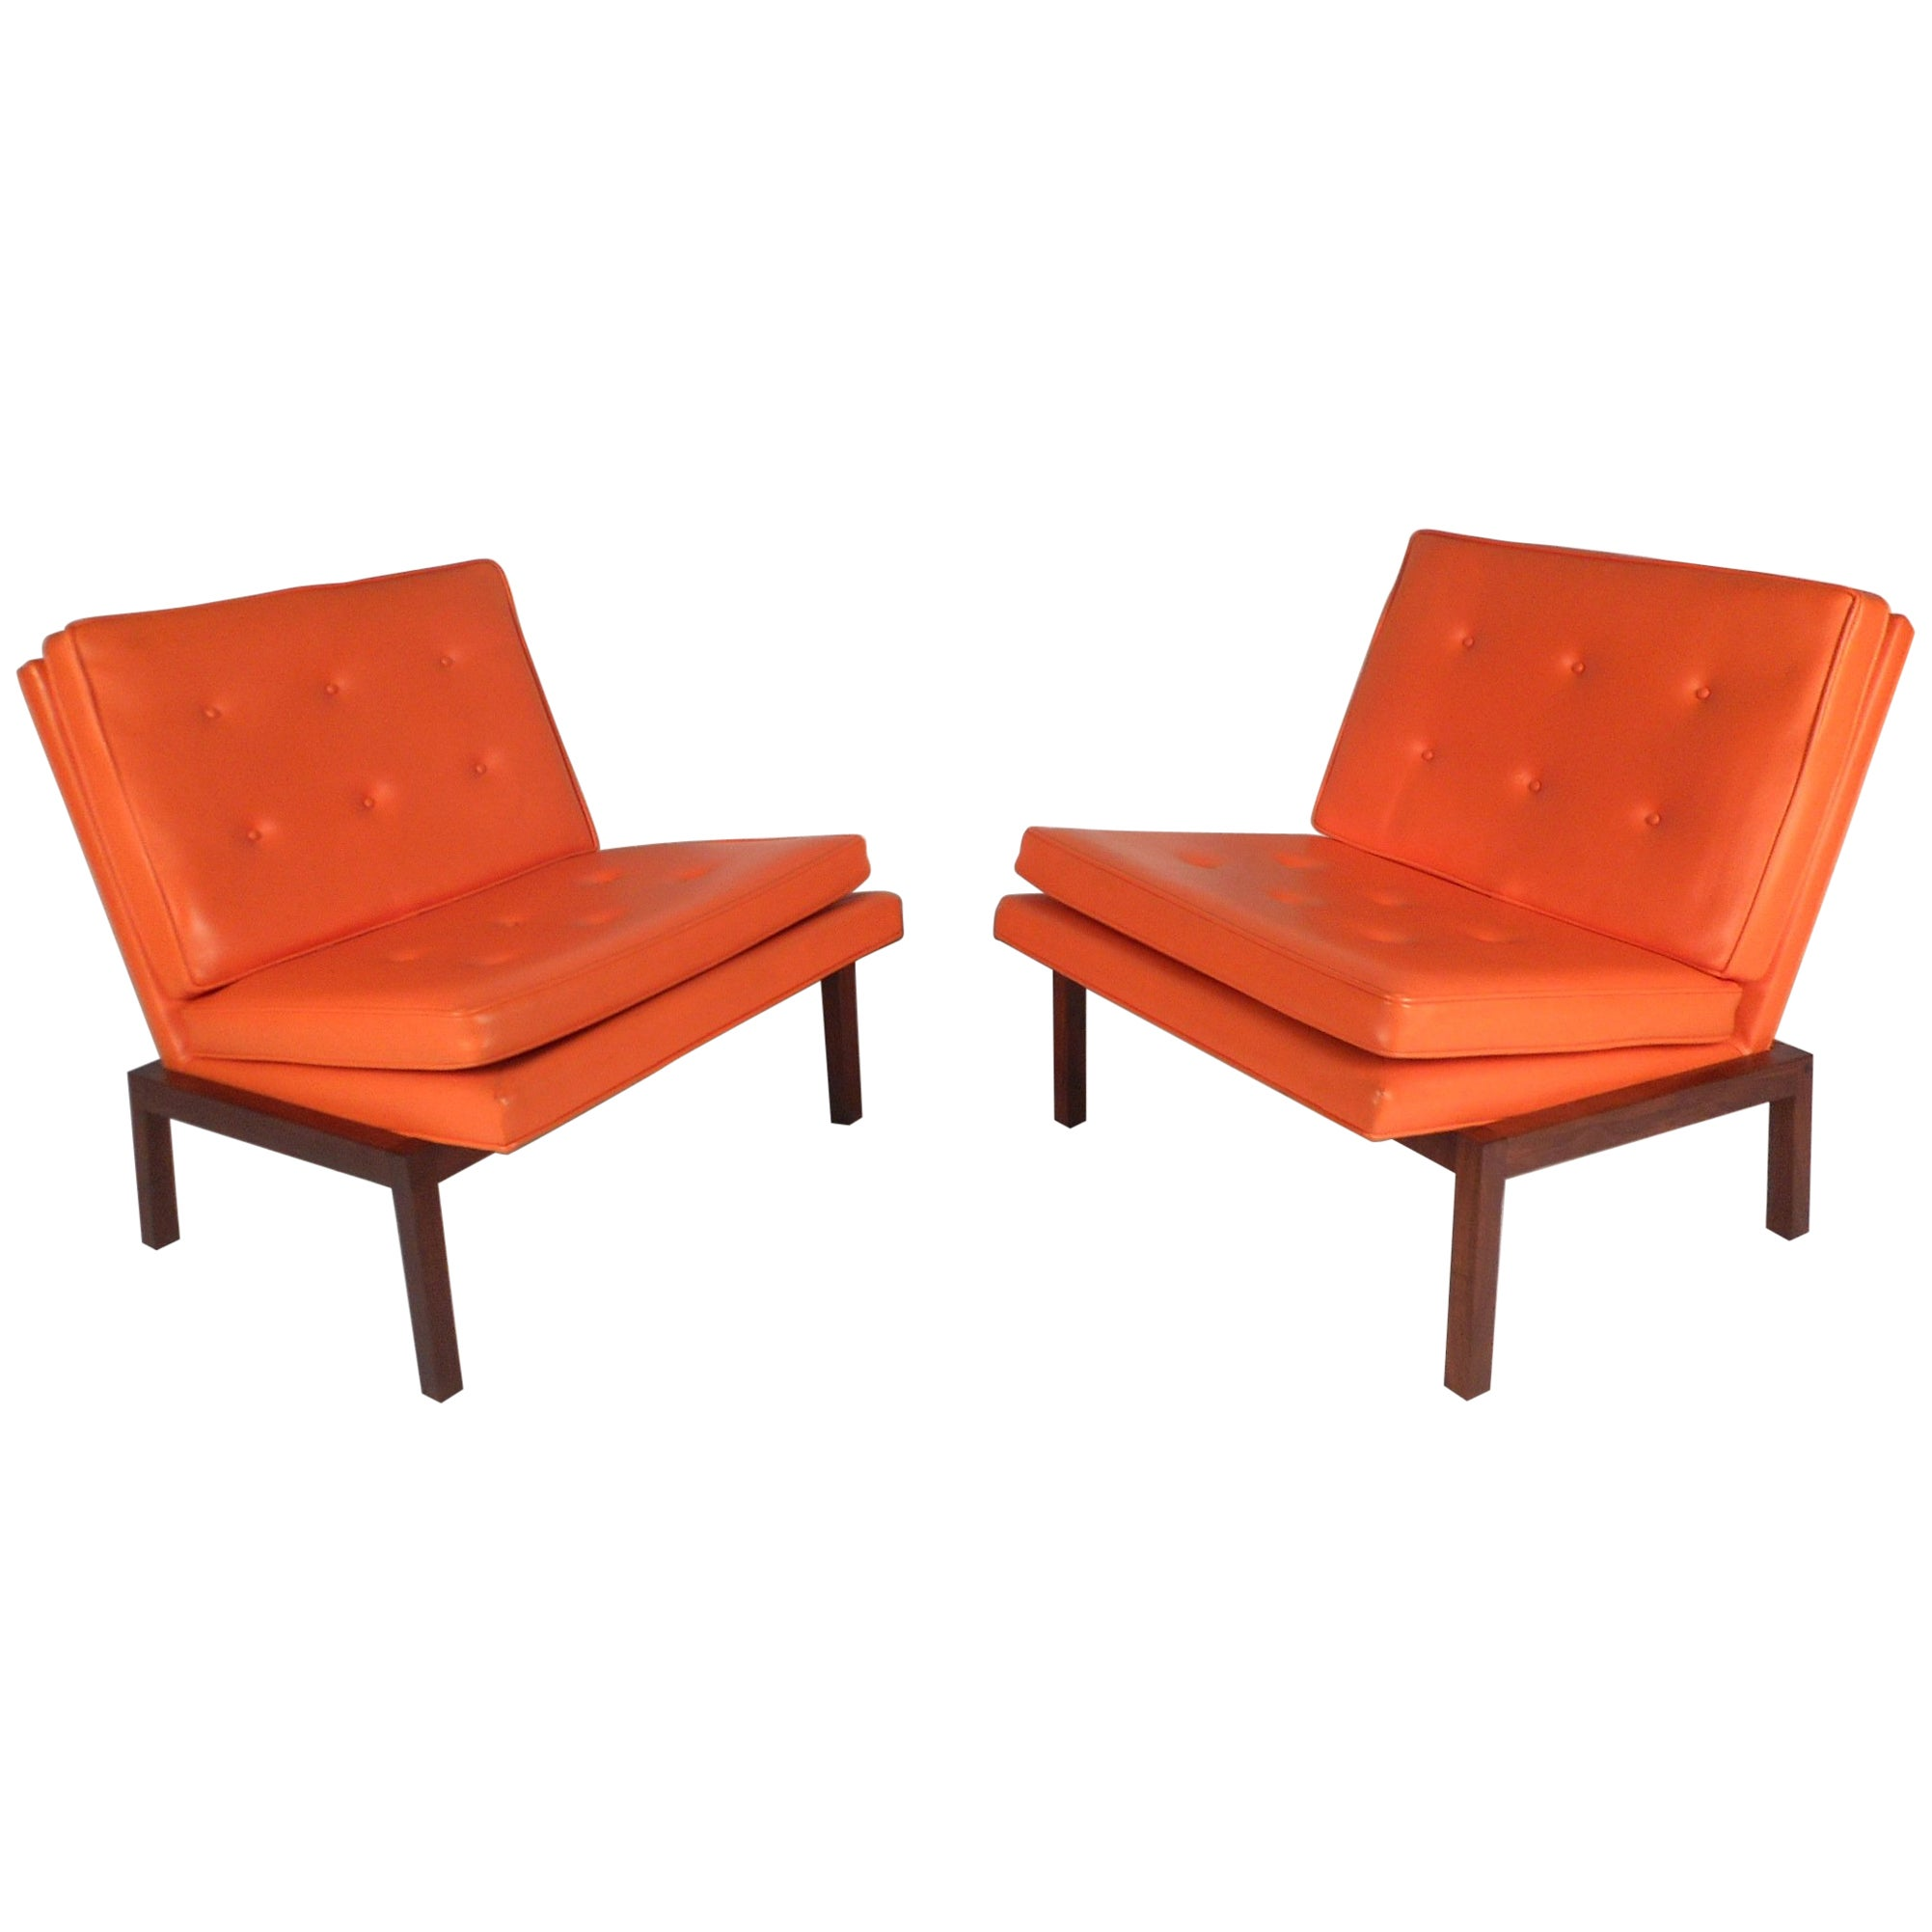 Mid-Century Modern Slipper Lounge Chairs by Milo Baughman for Thayer Coggin